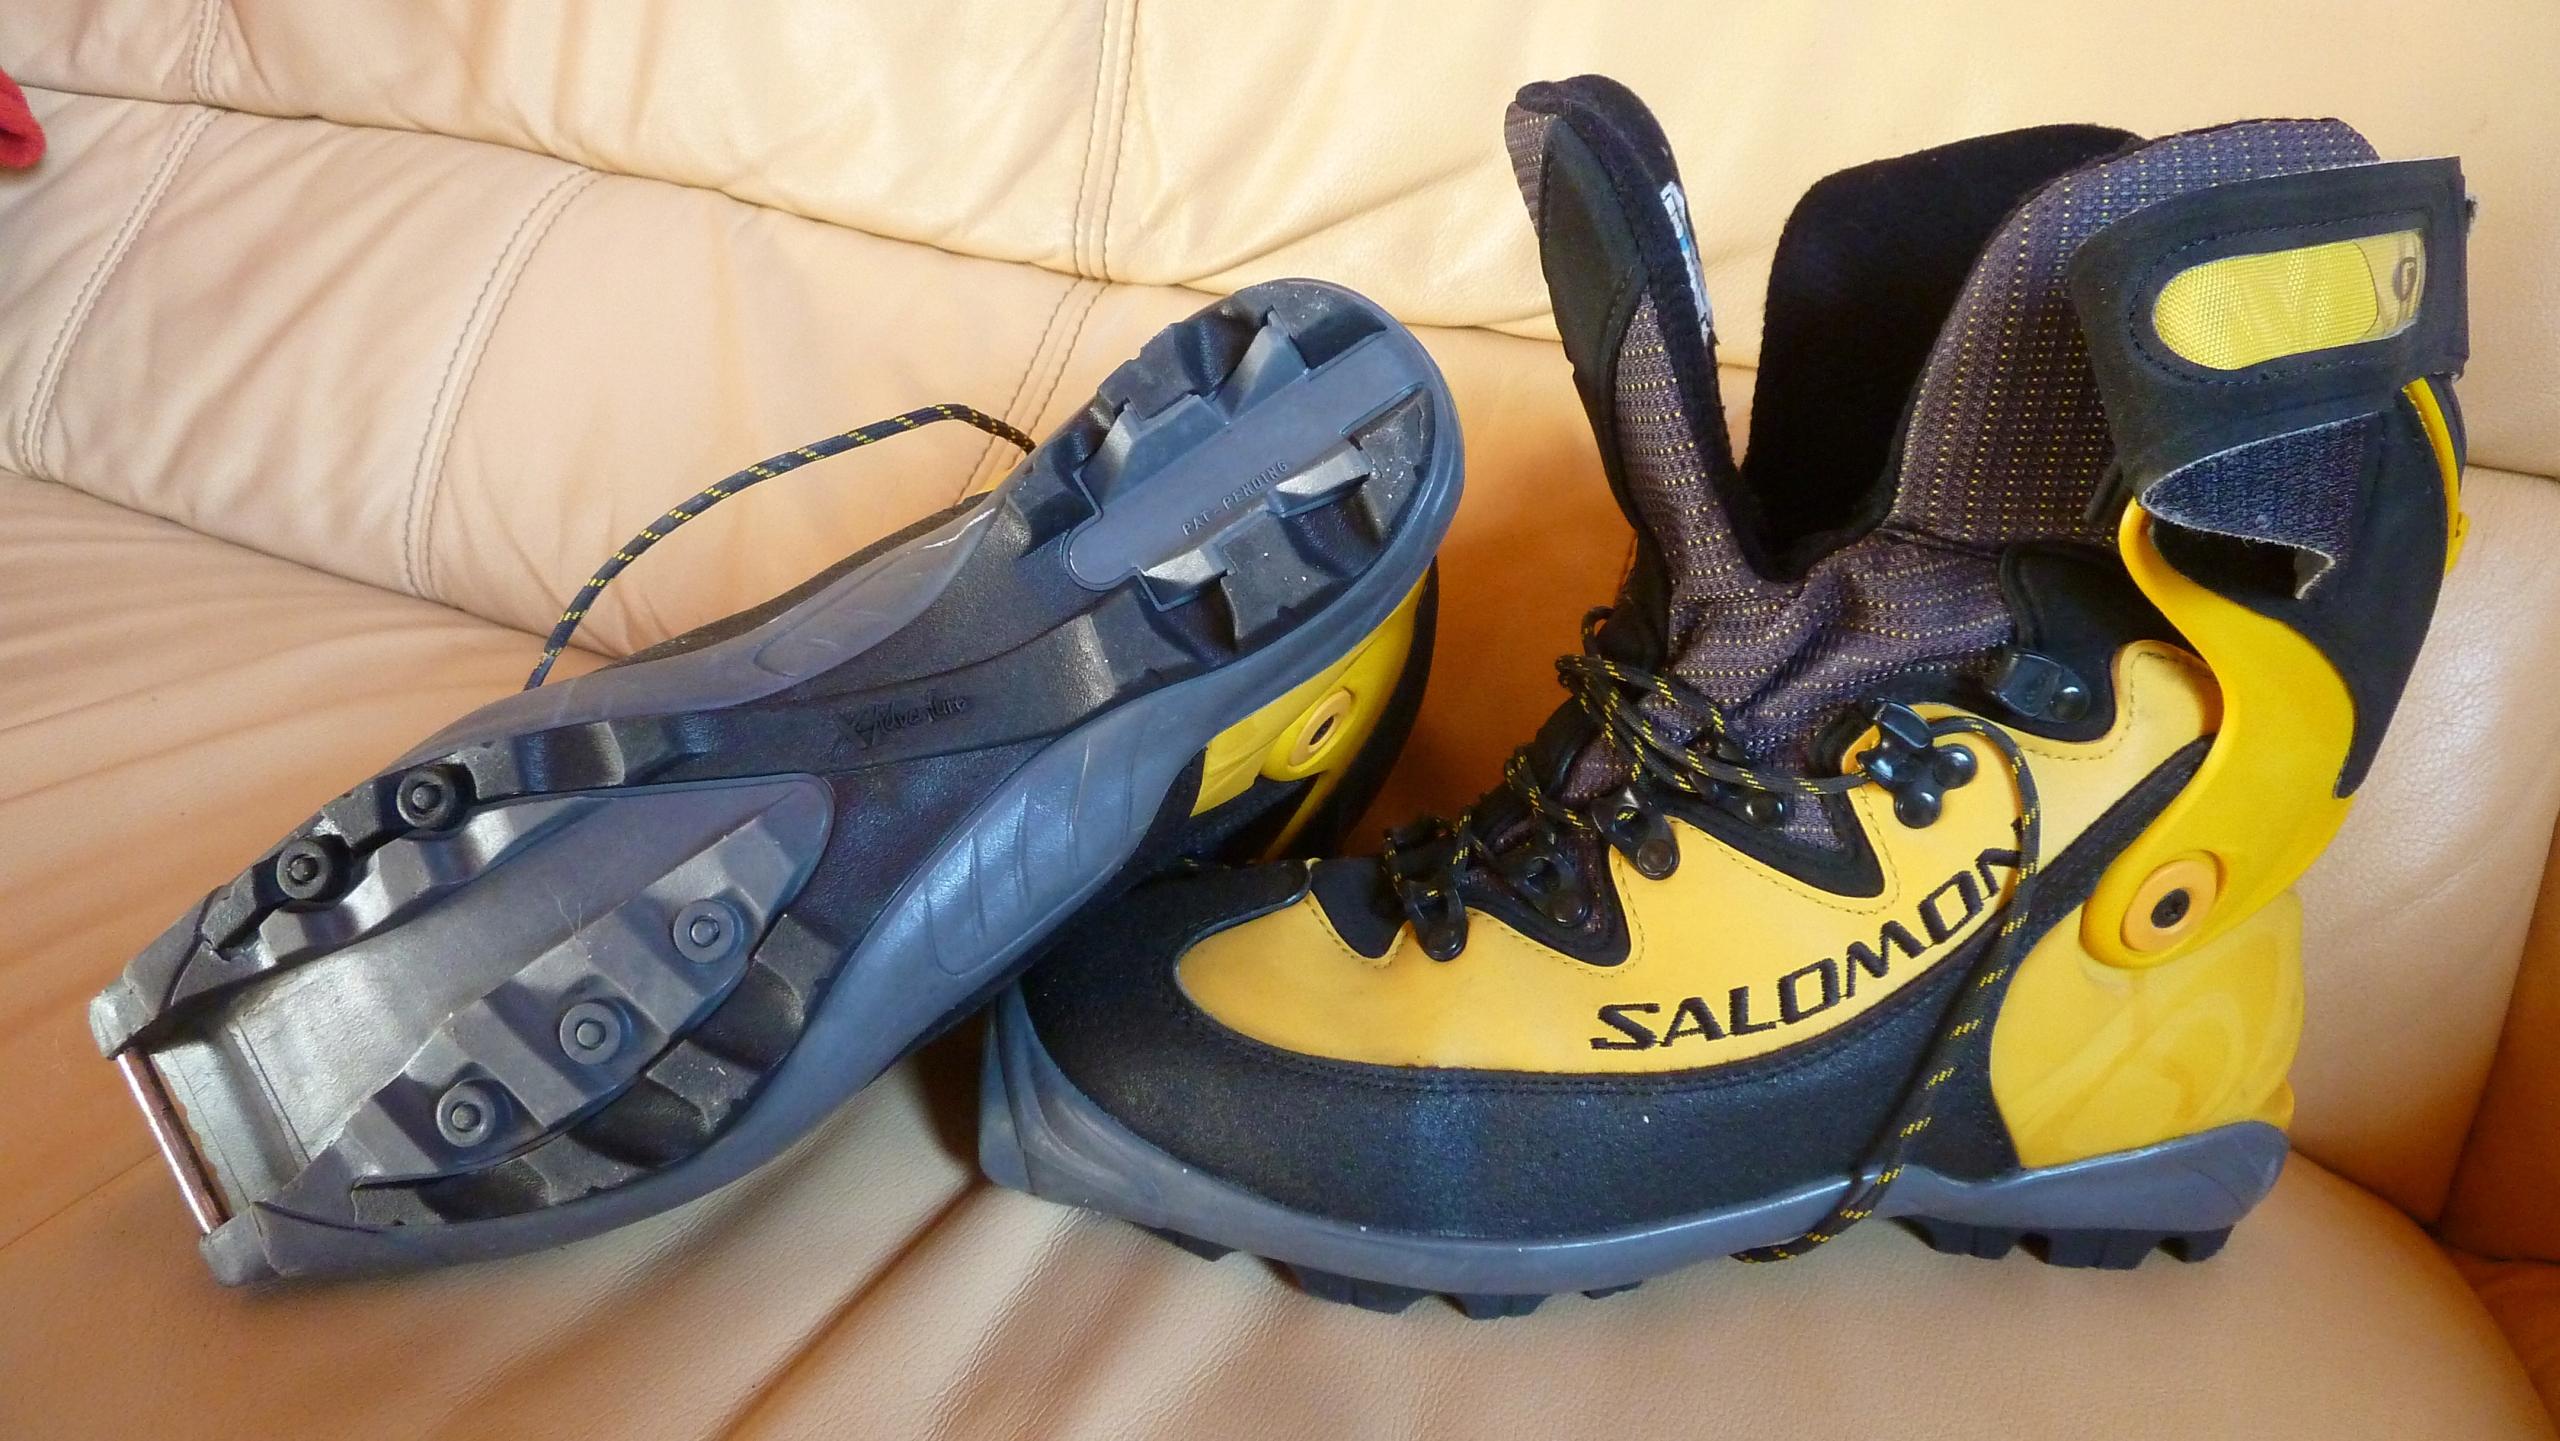 Buty biegowe backcountry Salomon XA 43 7827955555